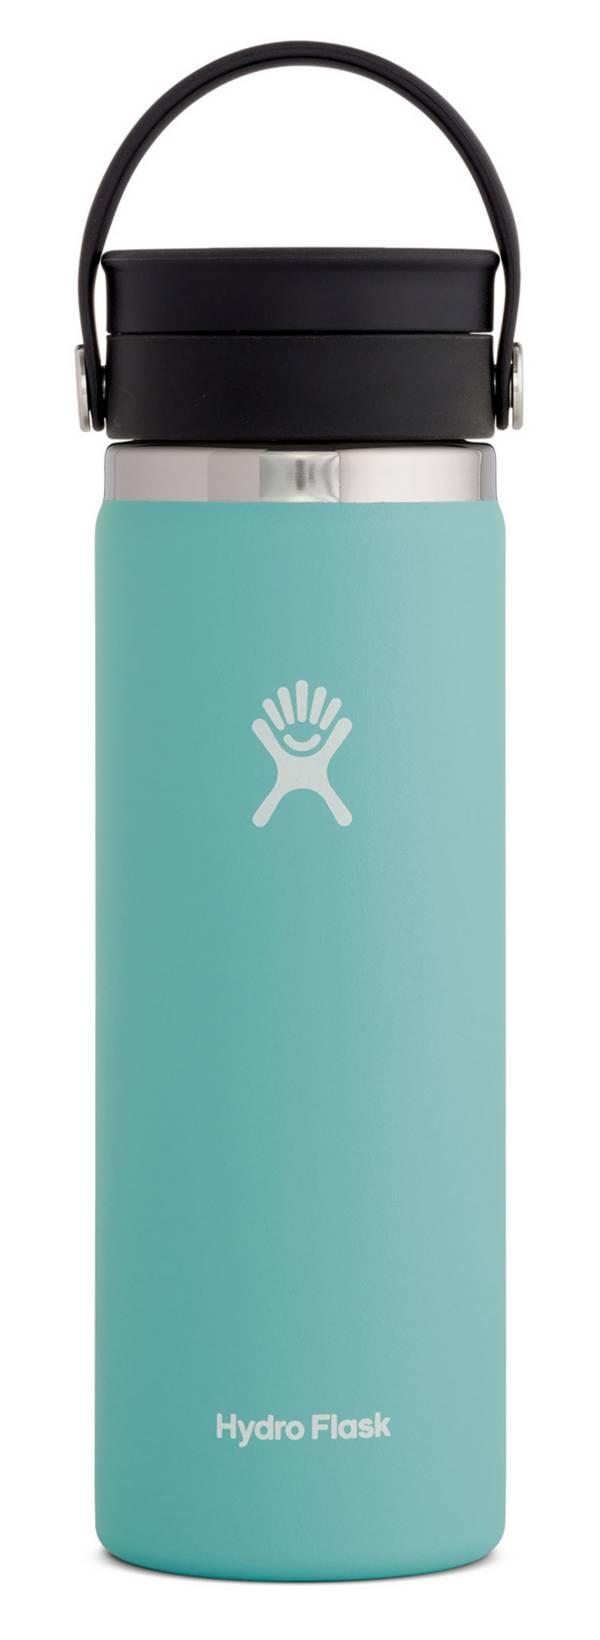 Hydro Flask Flex Sip 20 oz. Bottle product image